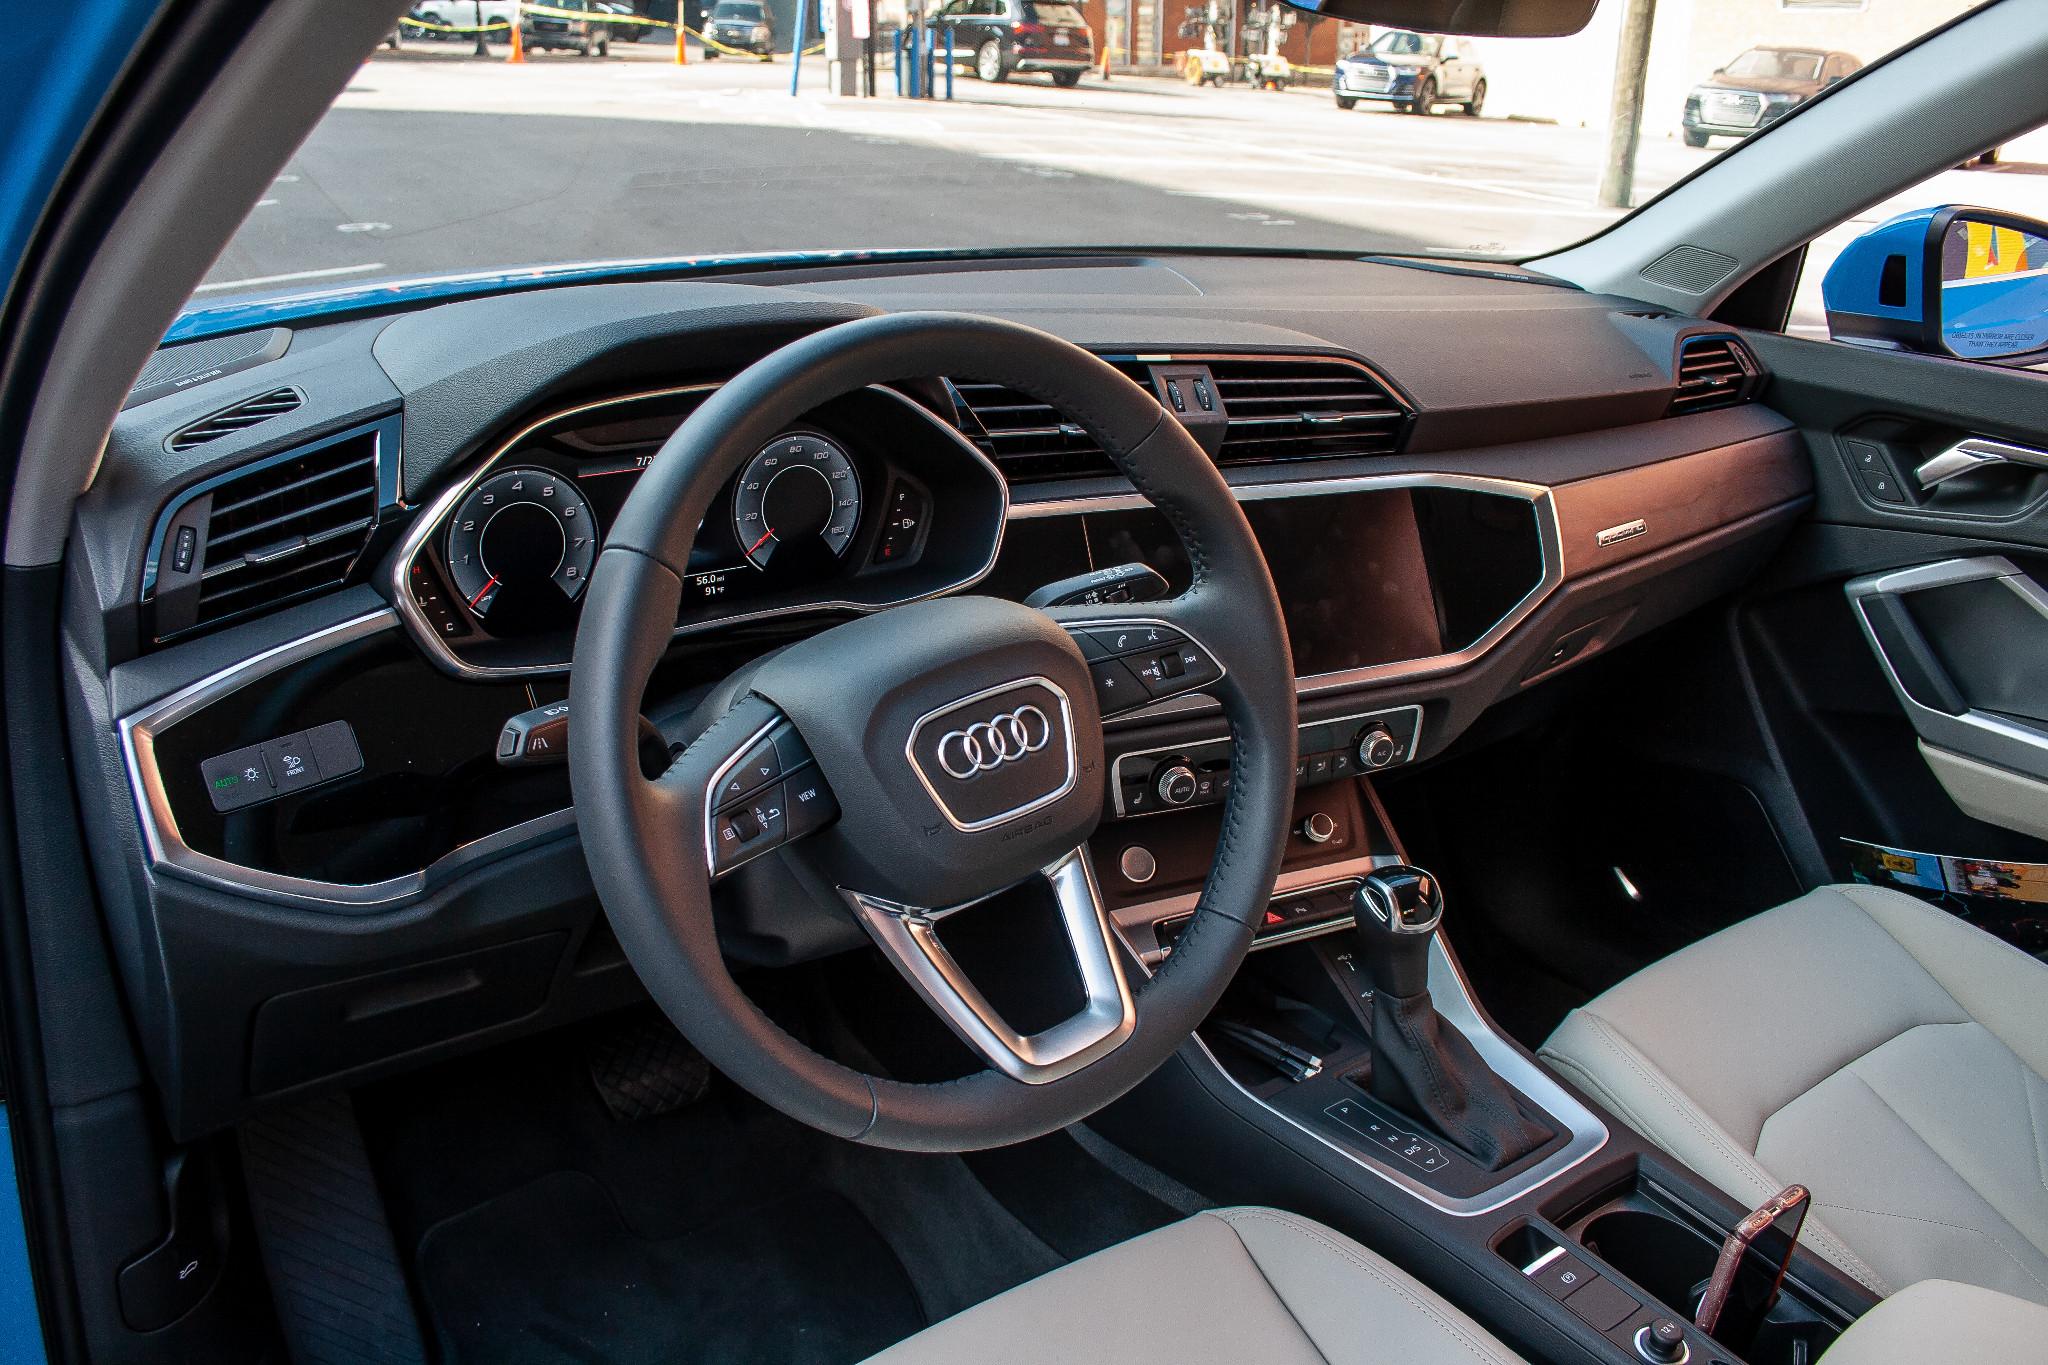 audi-q3-2019-11-front-row--interior--steering-wheel.jpg